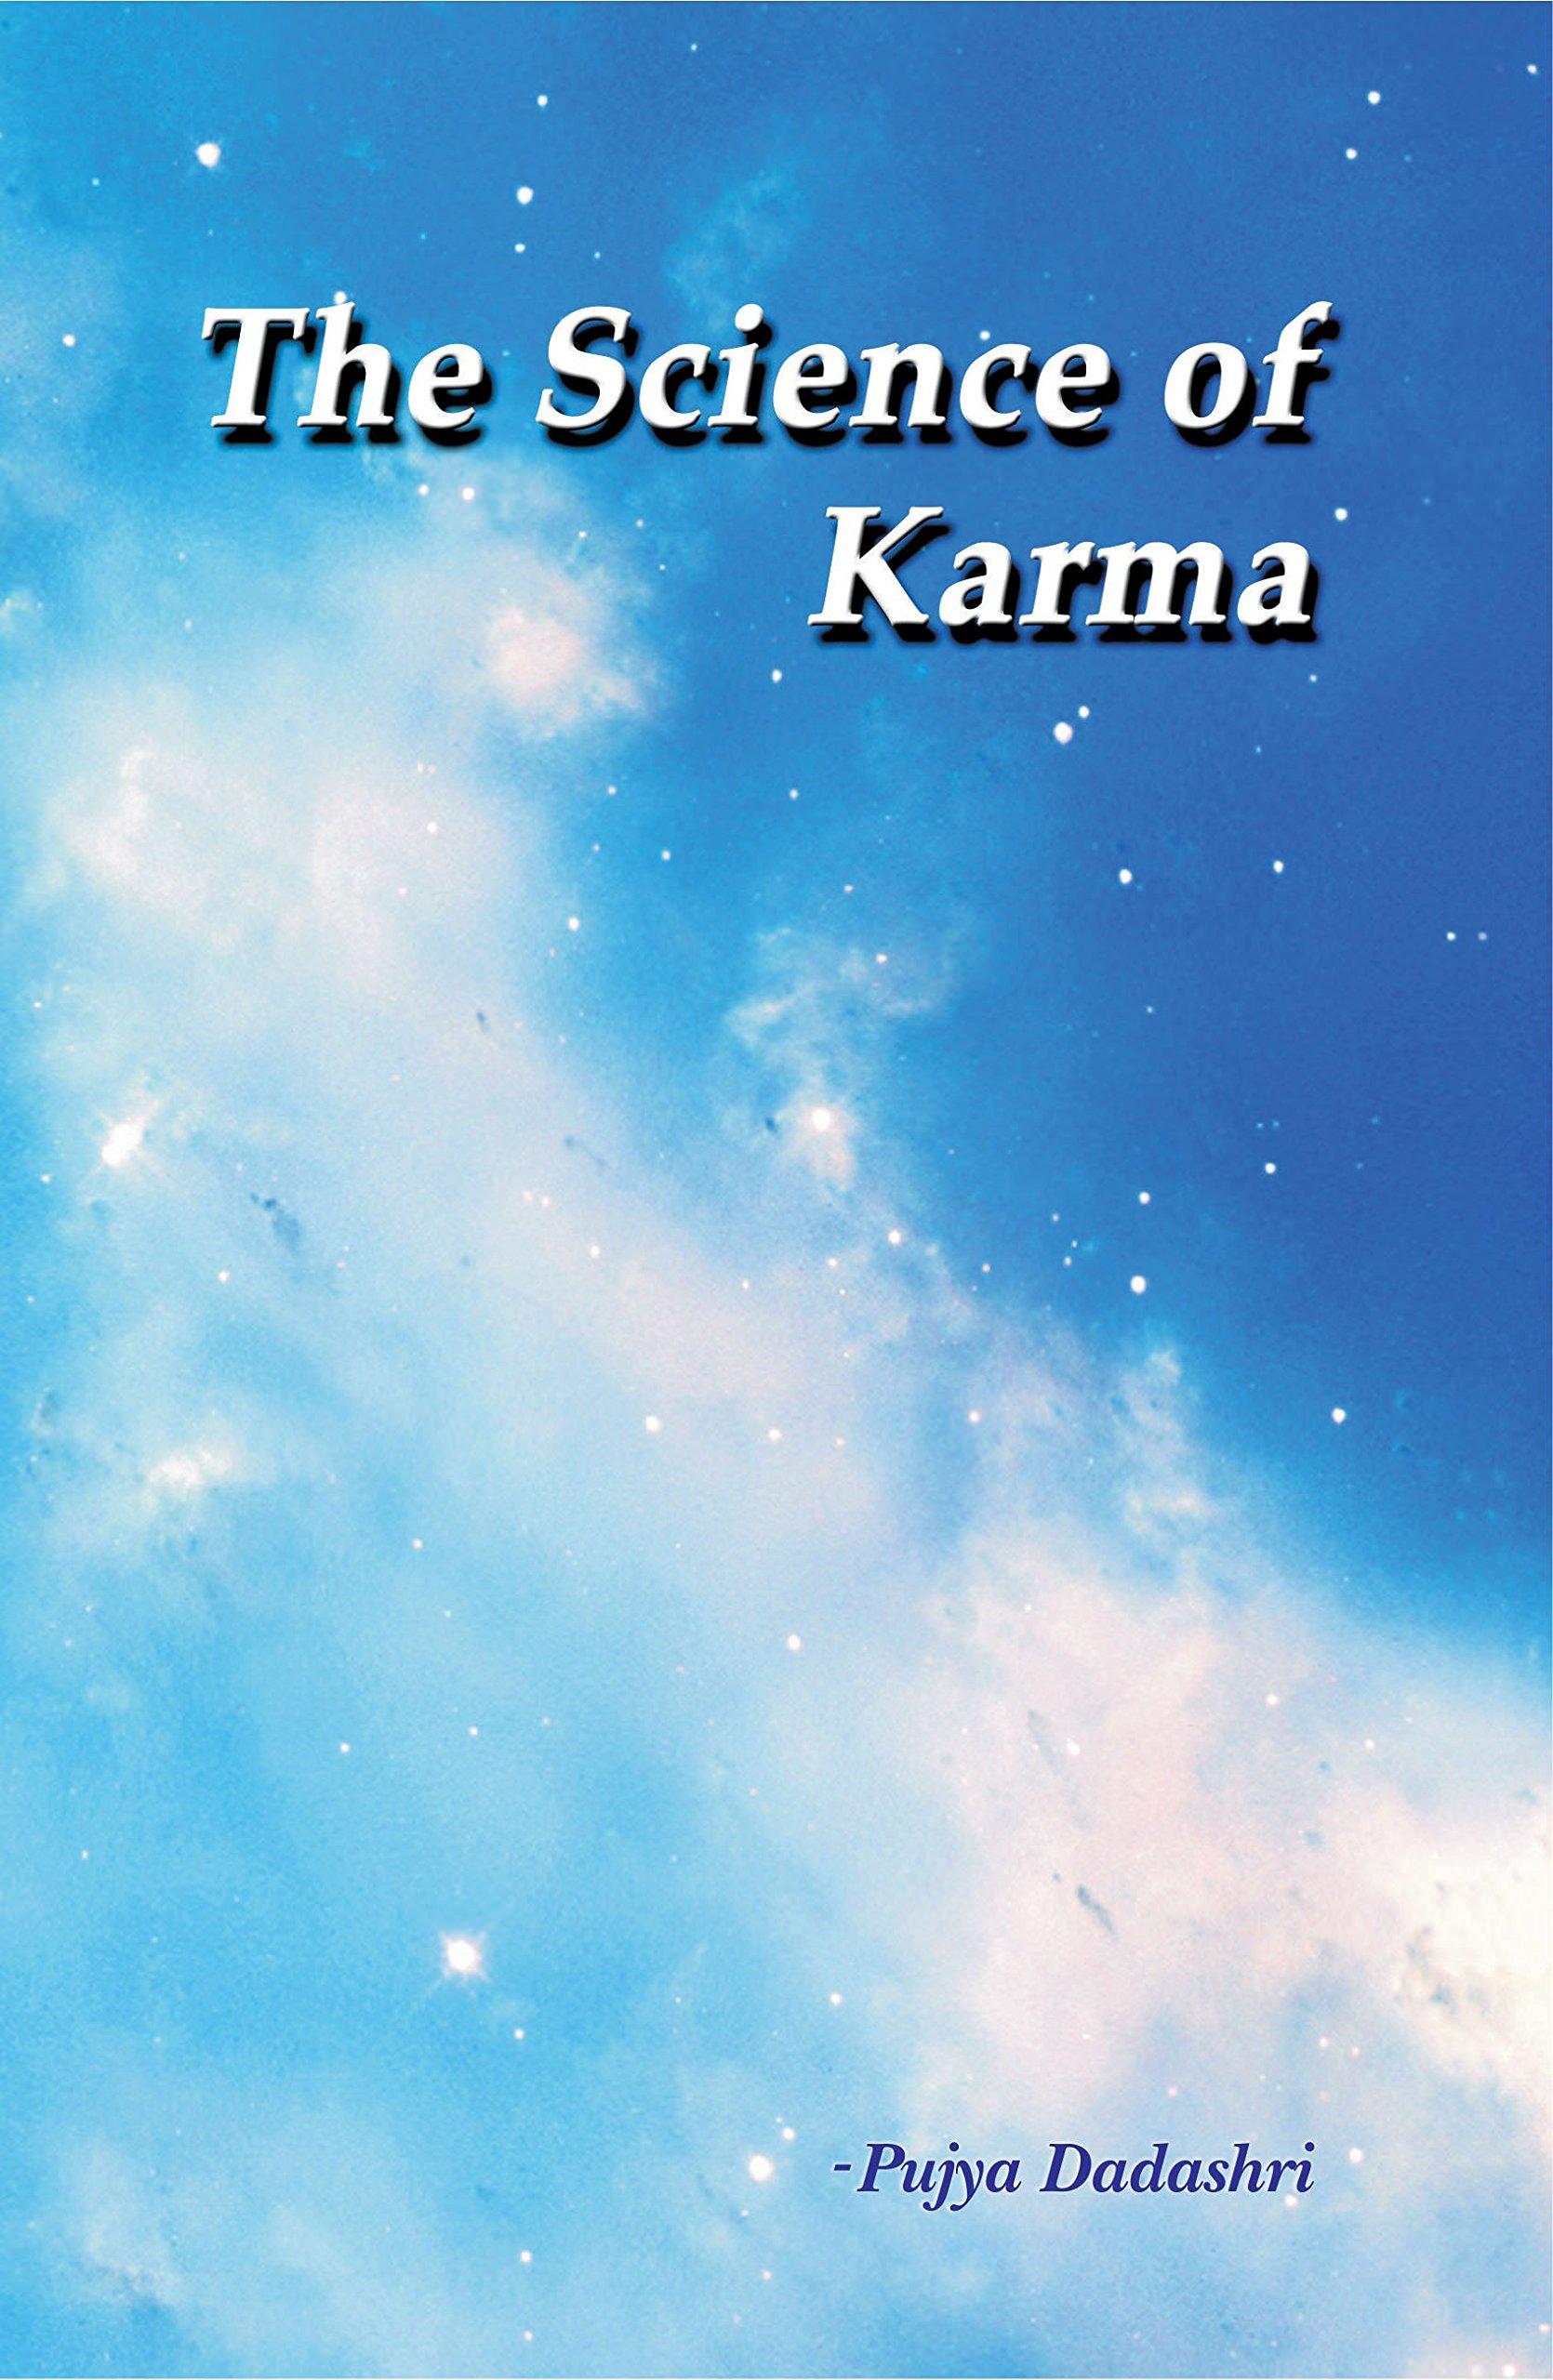 Image result for The science of karma dadashri